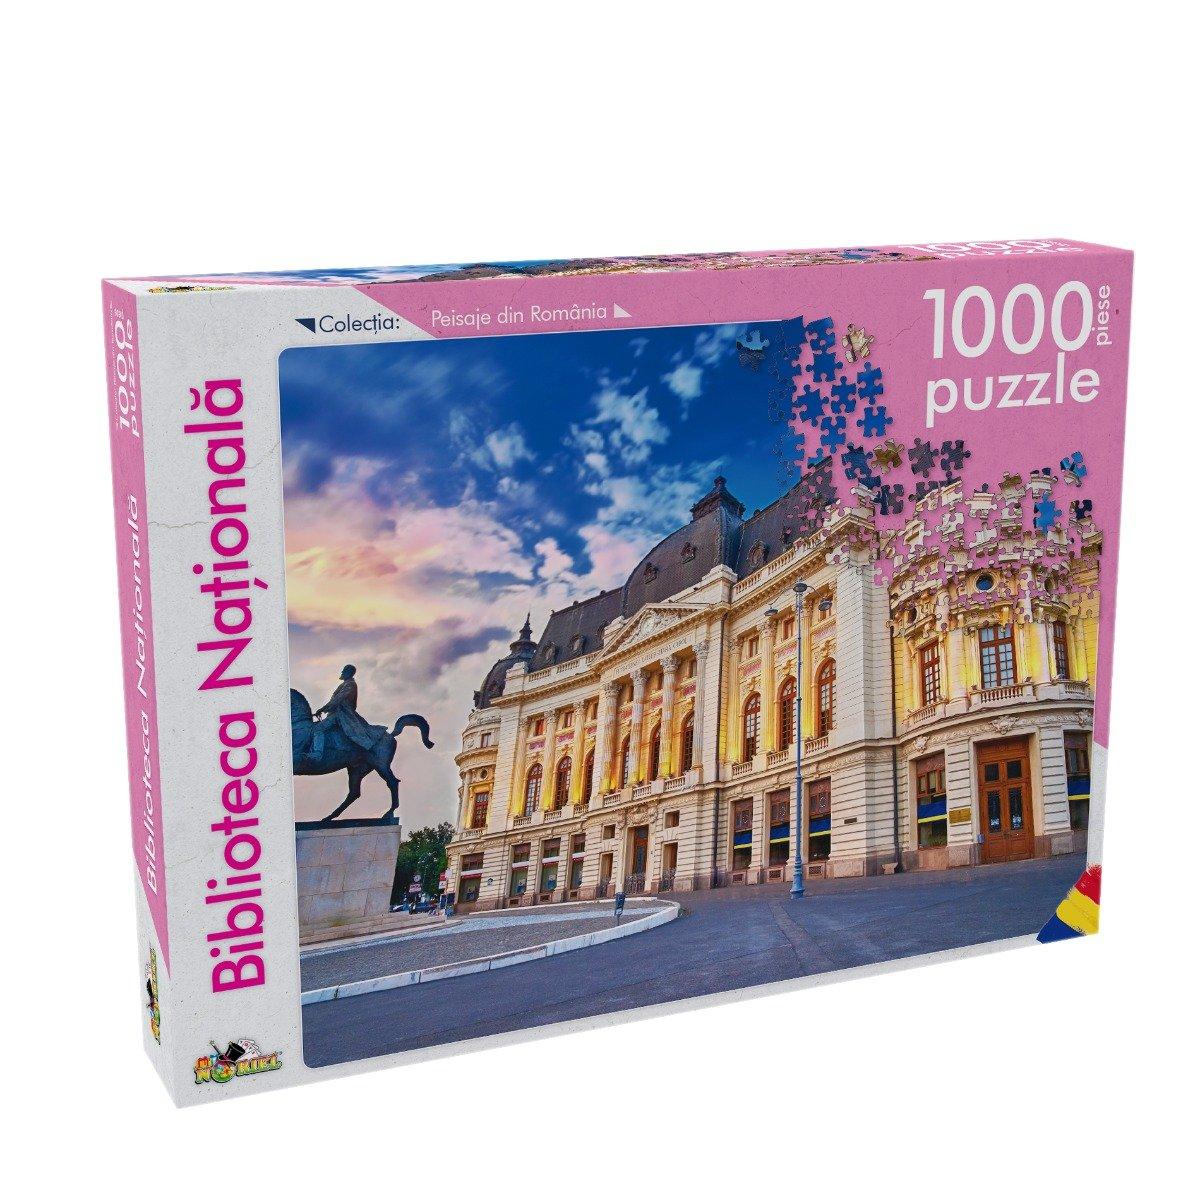 Puzzle Noriel - Peisaje din Romania - Biblioteca Nationala, 1000 Piese